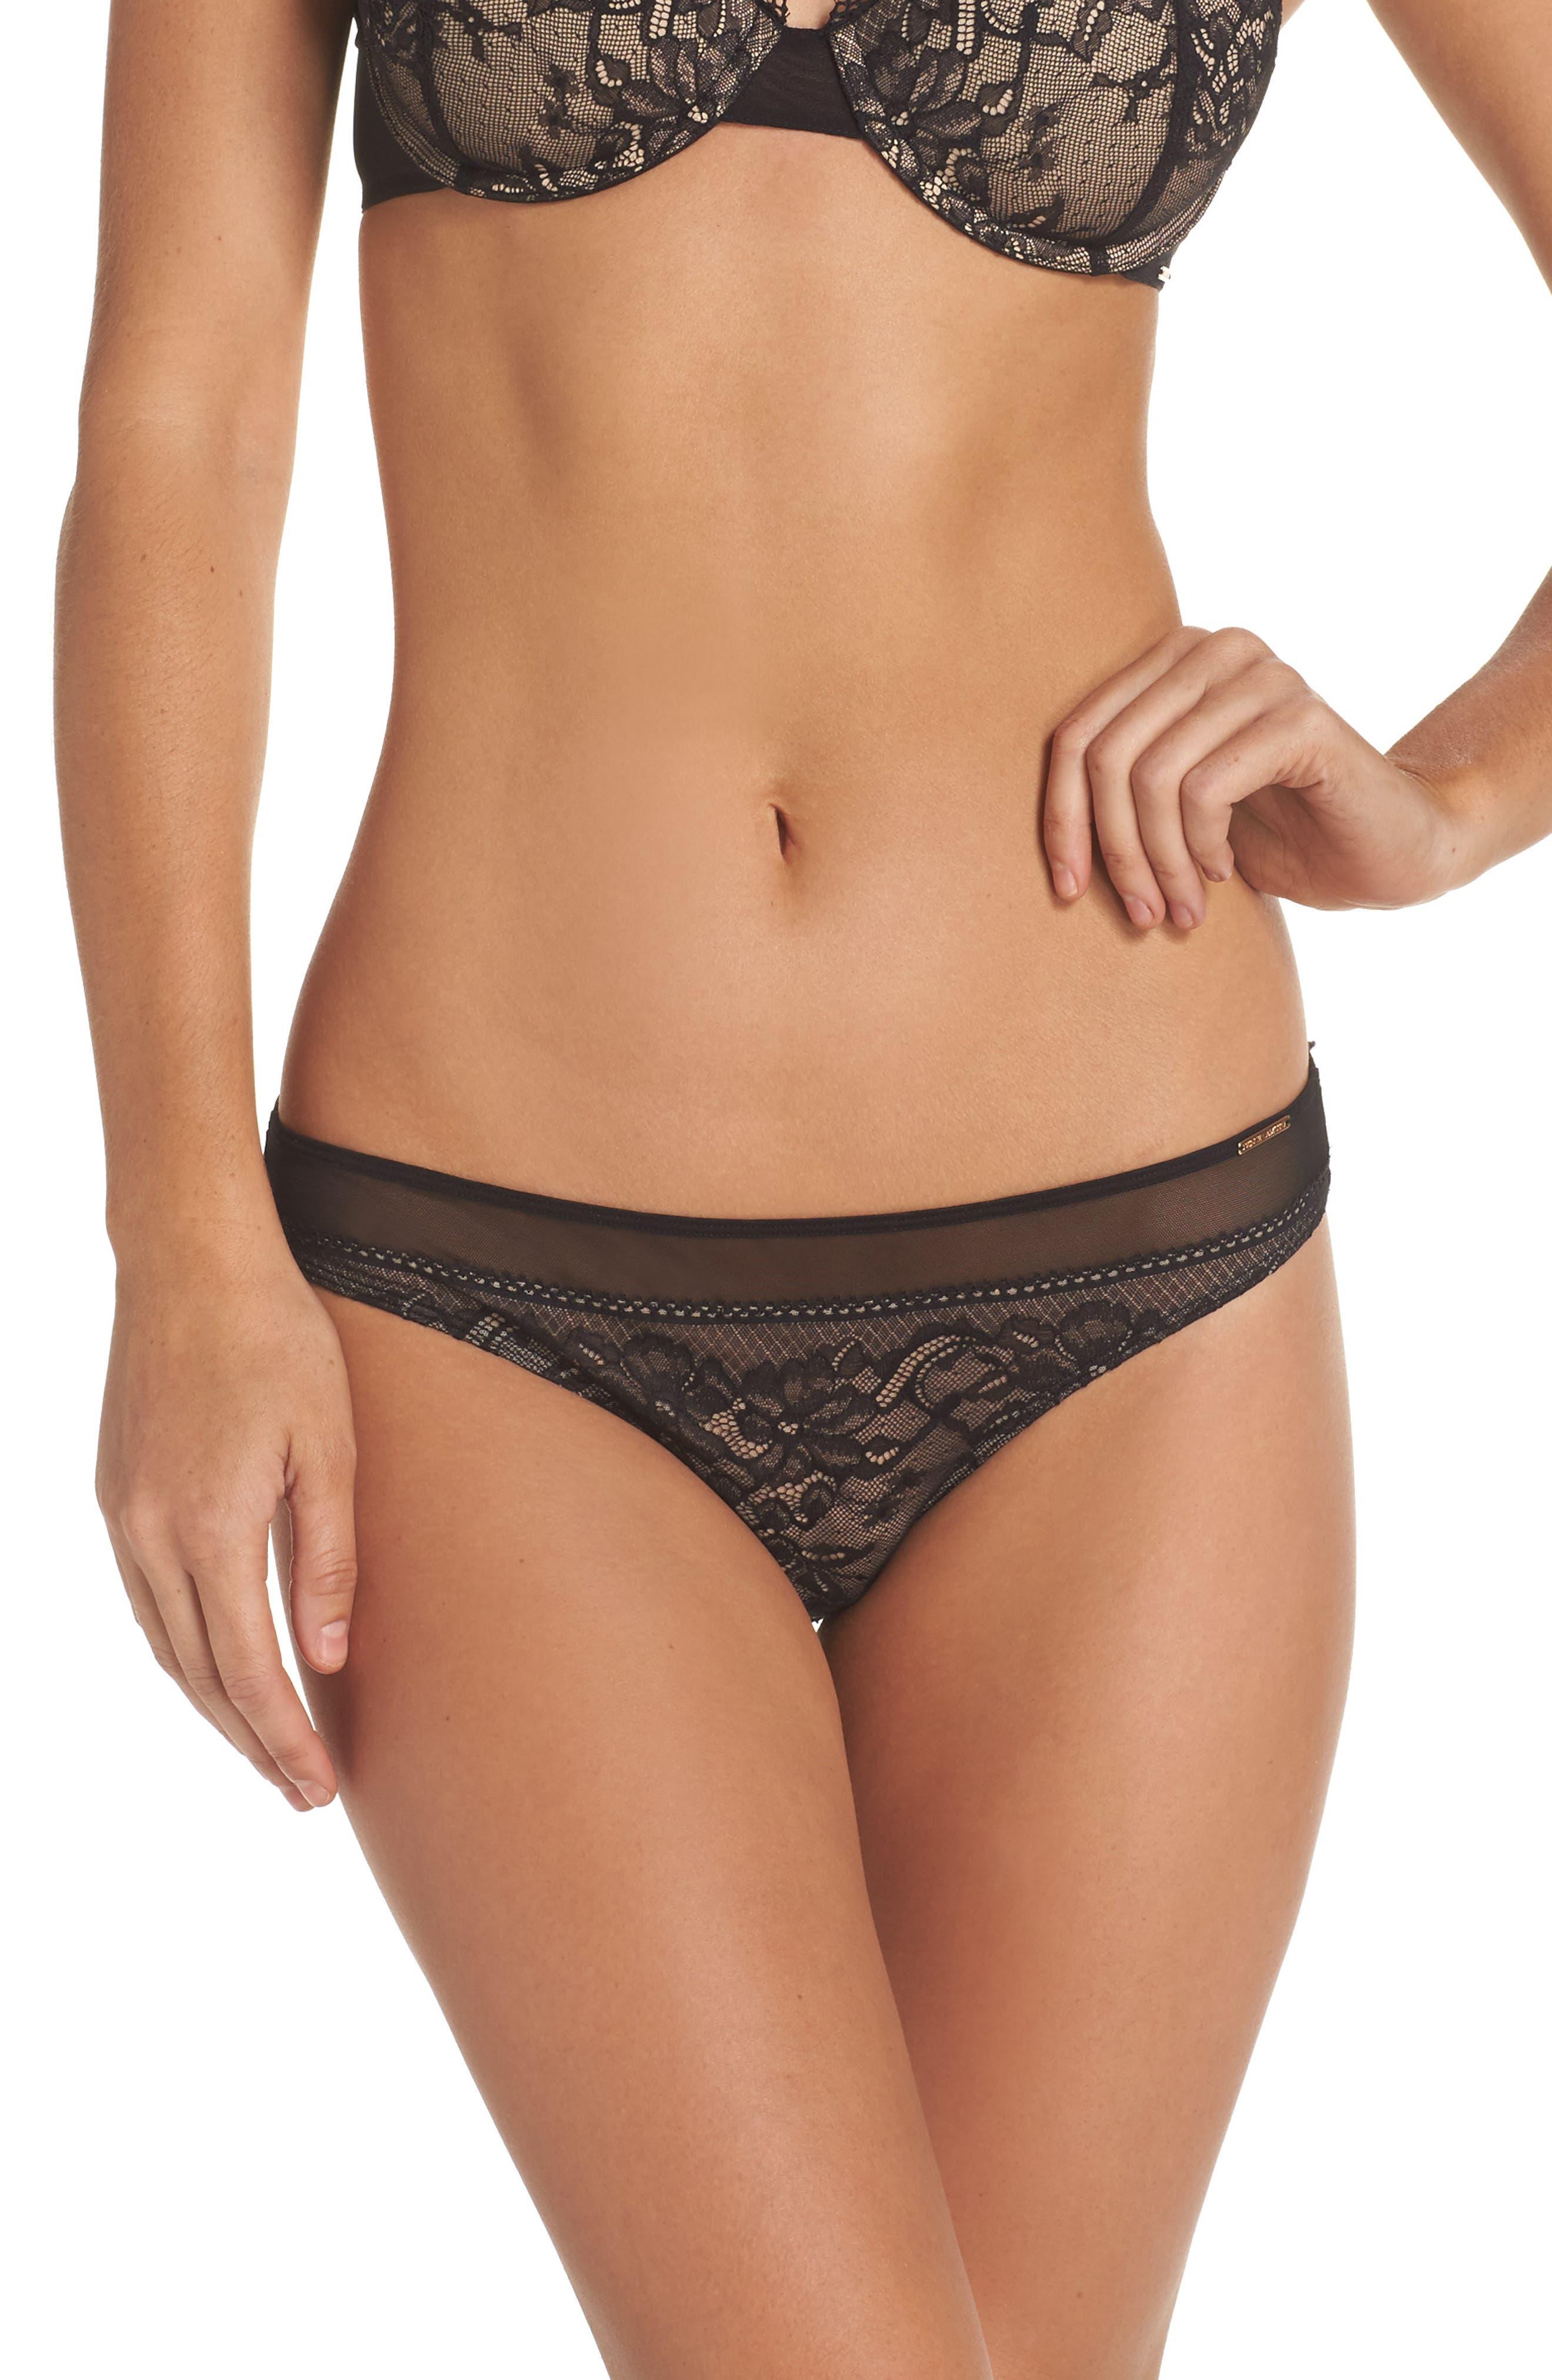 Lorelai Bikini,                             Main thumbnail 1, color,                             Black